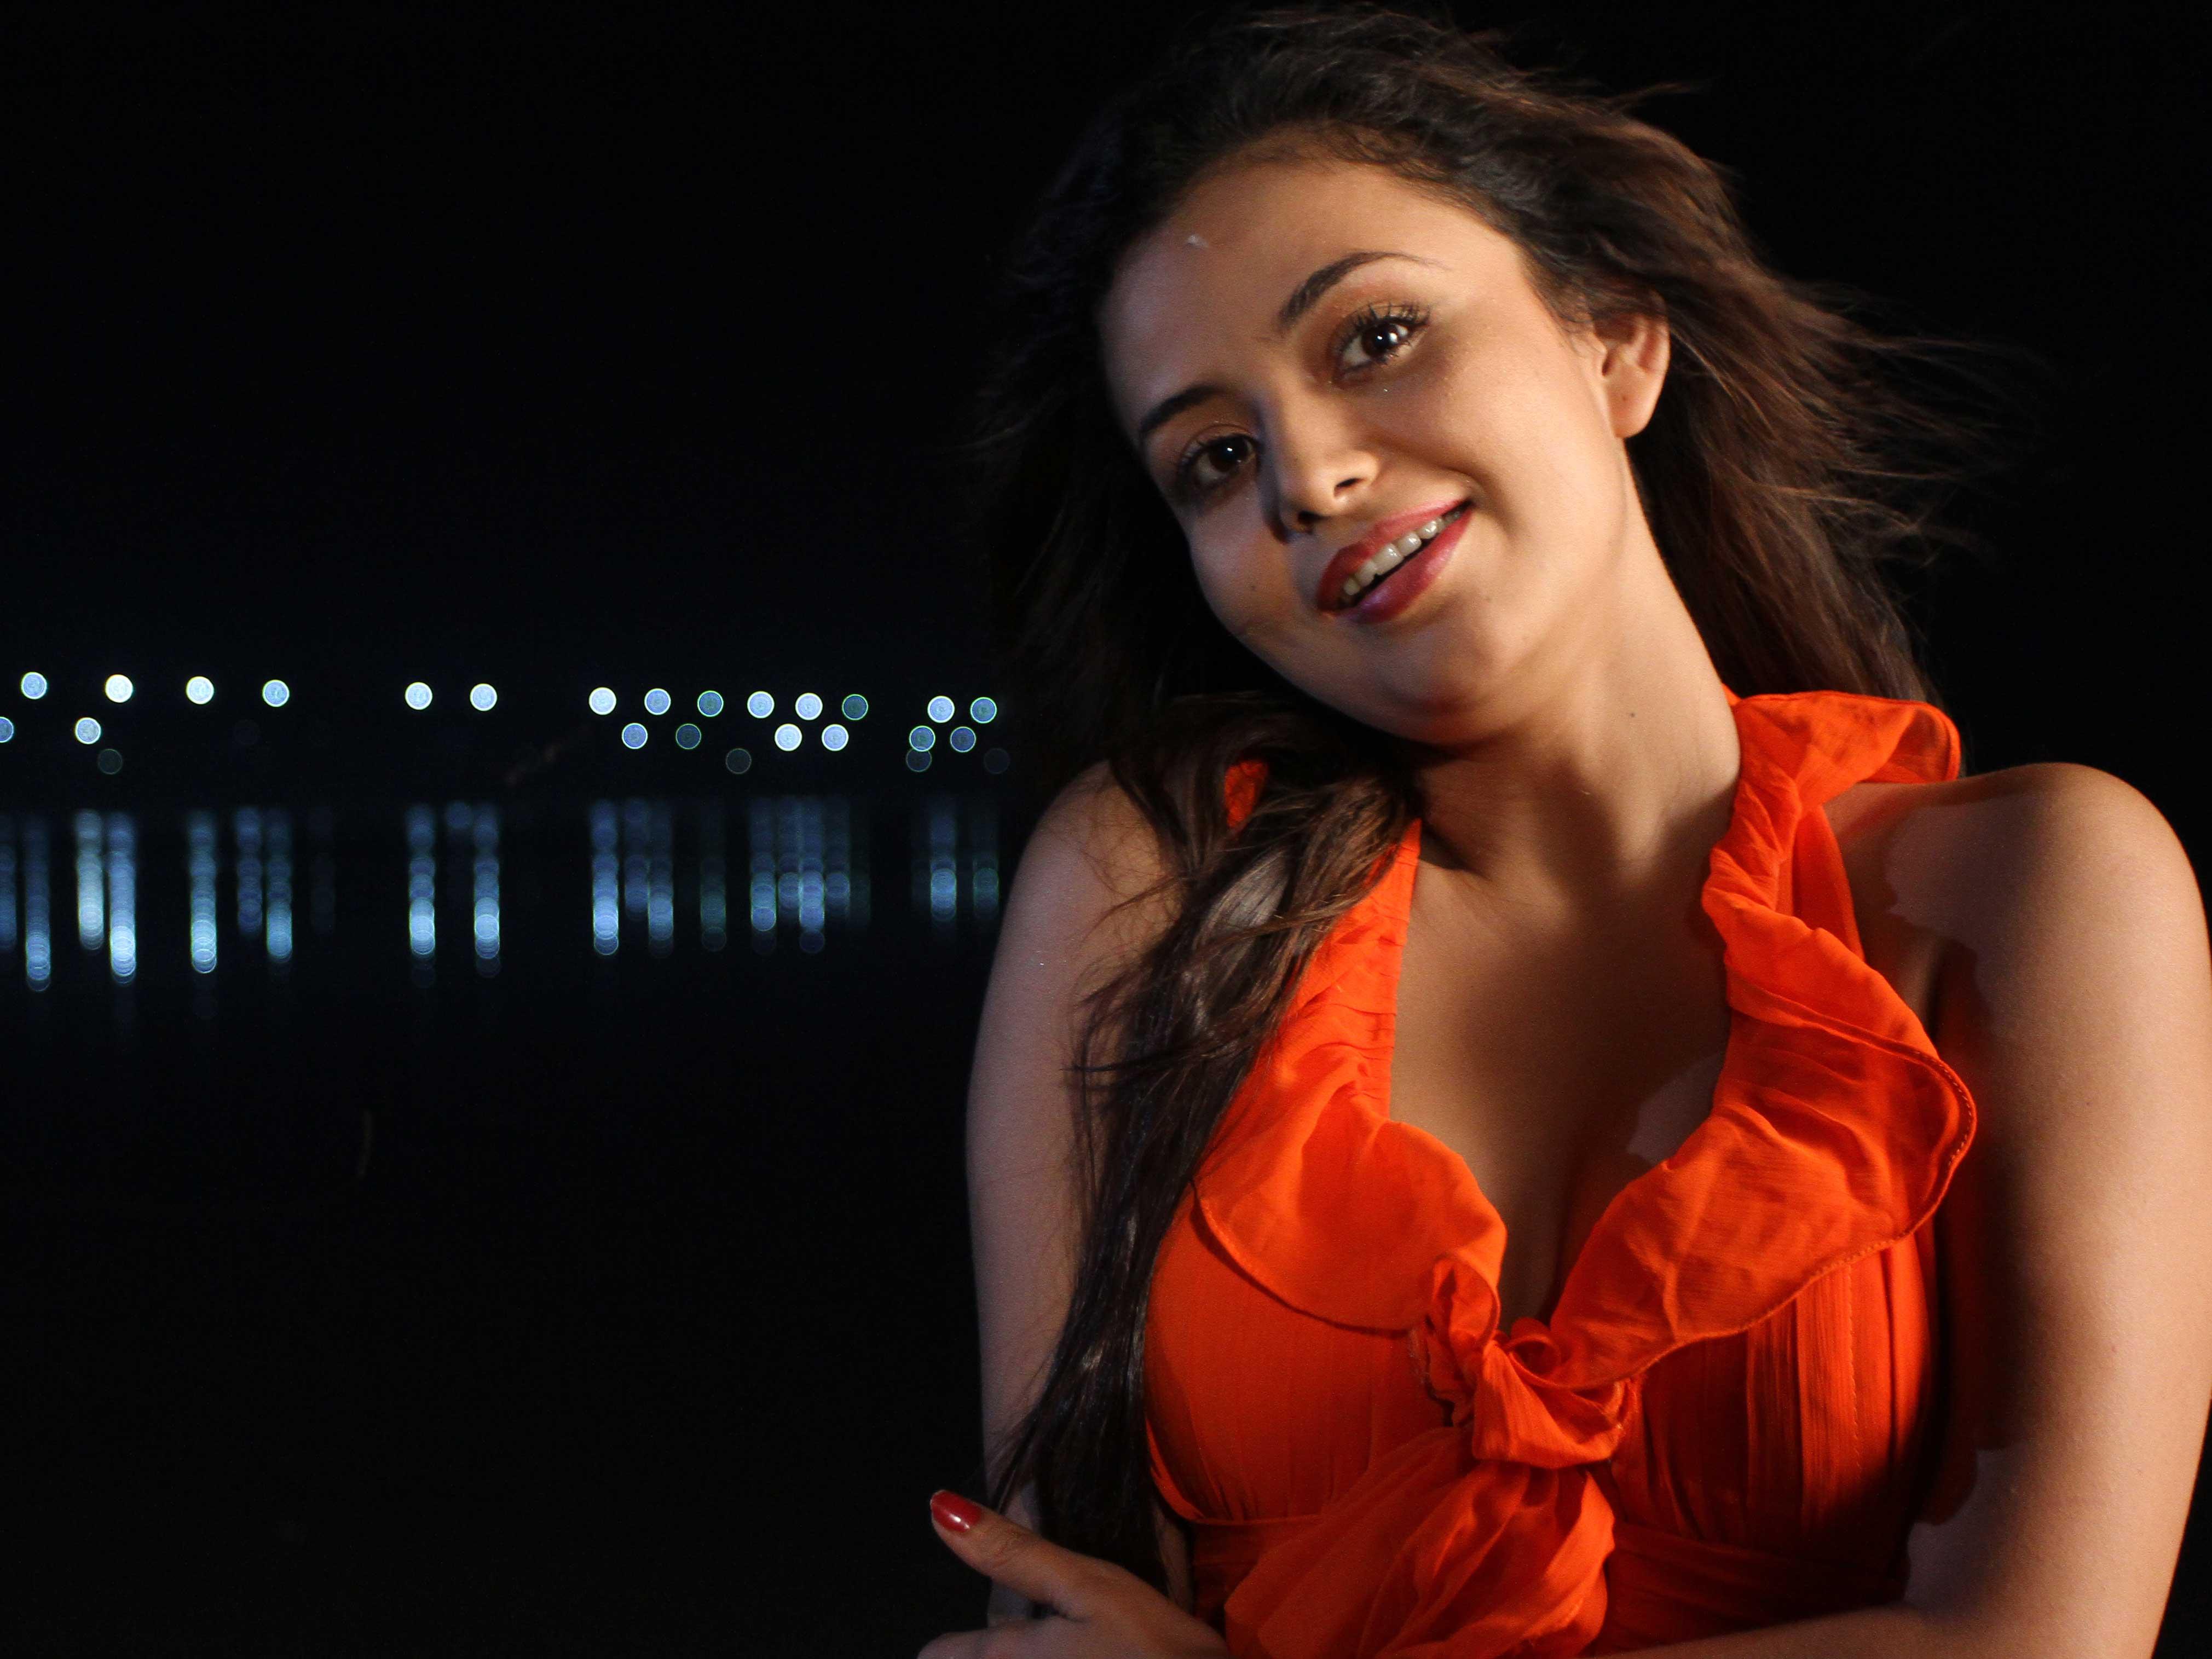 Neeta Dhungana nude (23 fotos) Boobs, Snapchat, panties